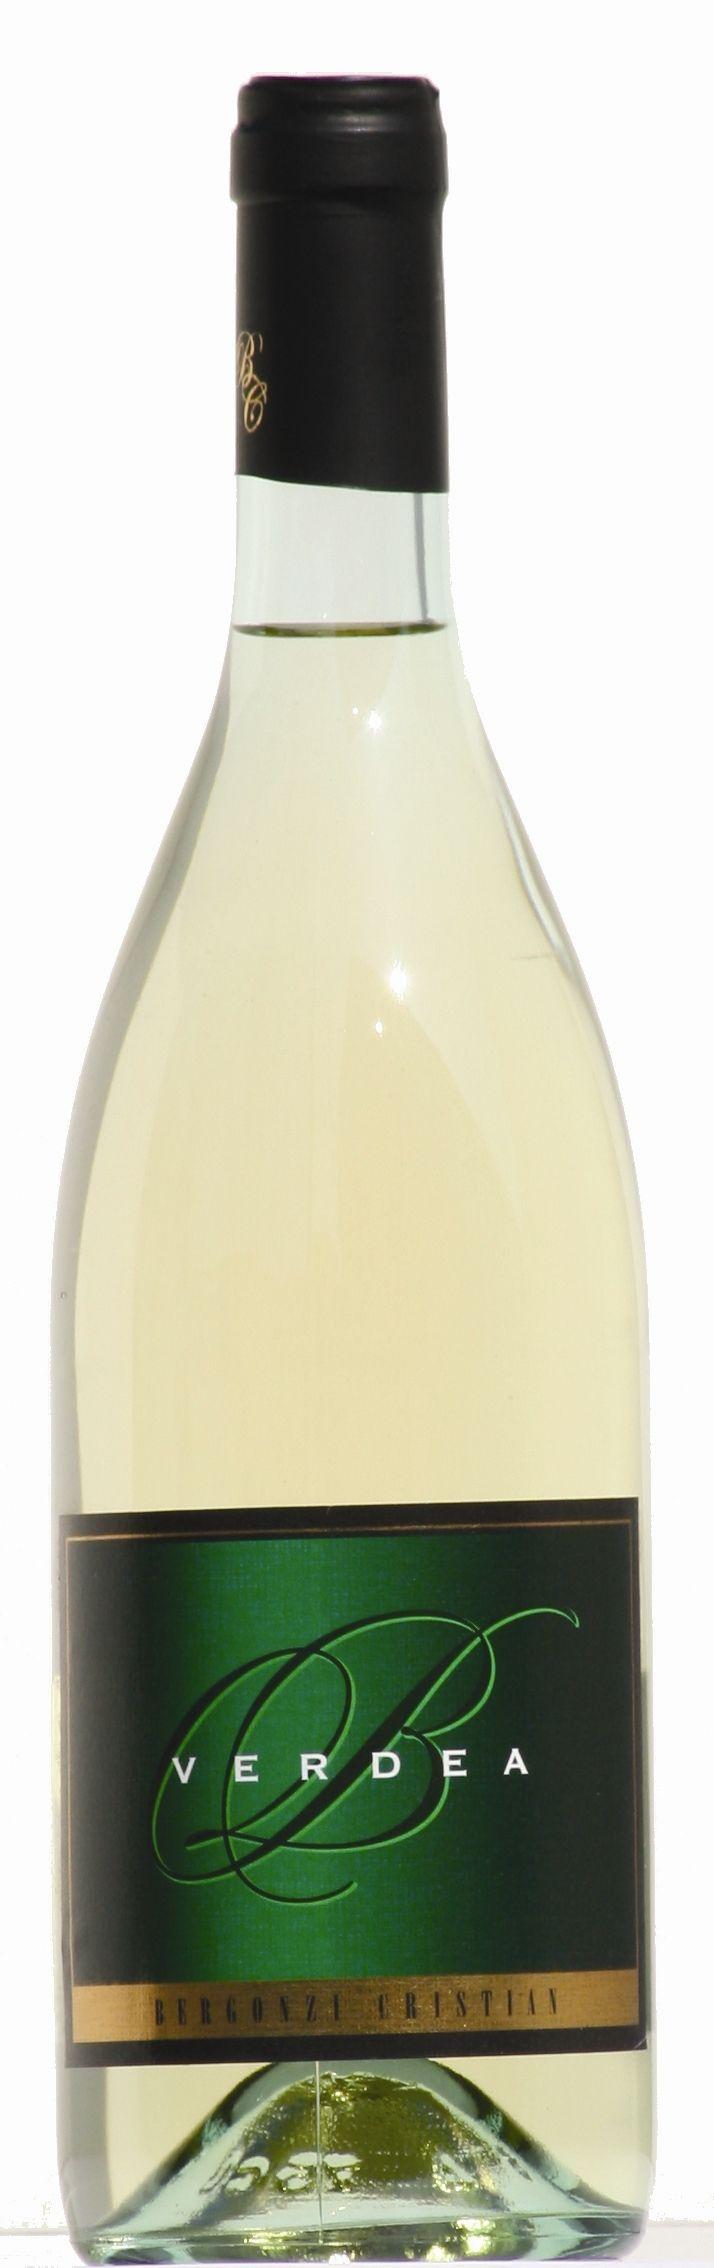 Azienda Agricola BERGONZI CRISTIAN - Vino Verdea